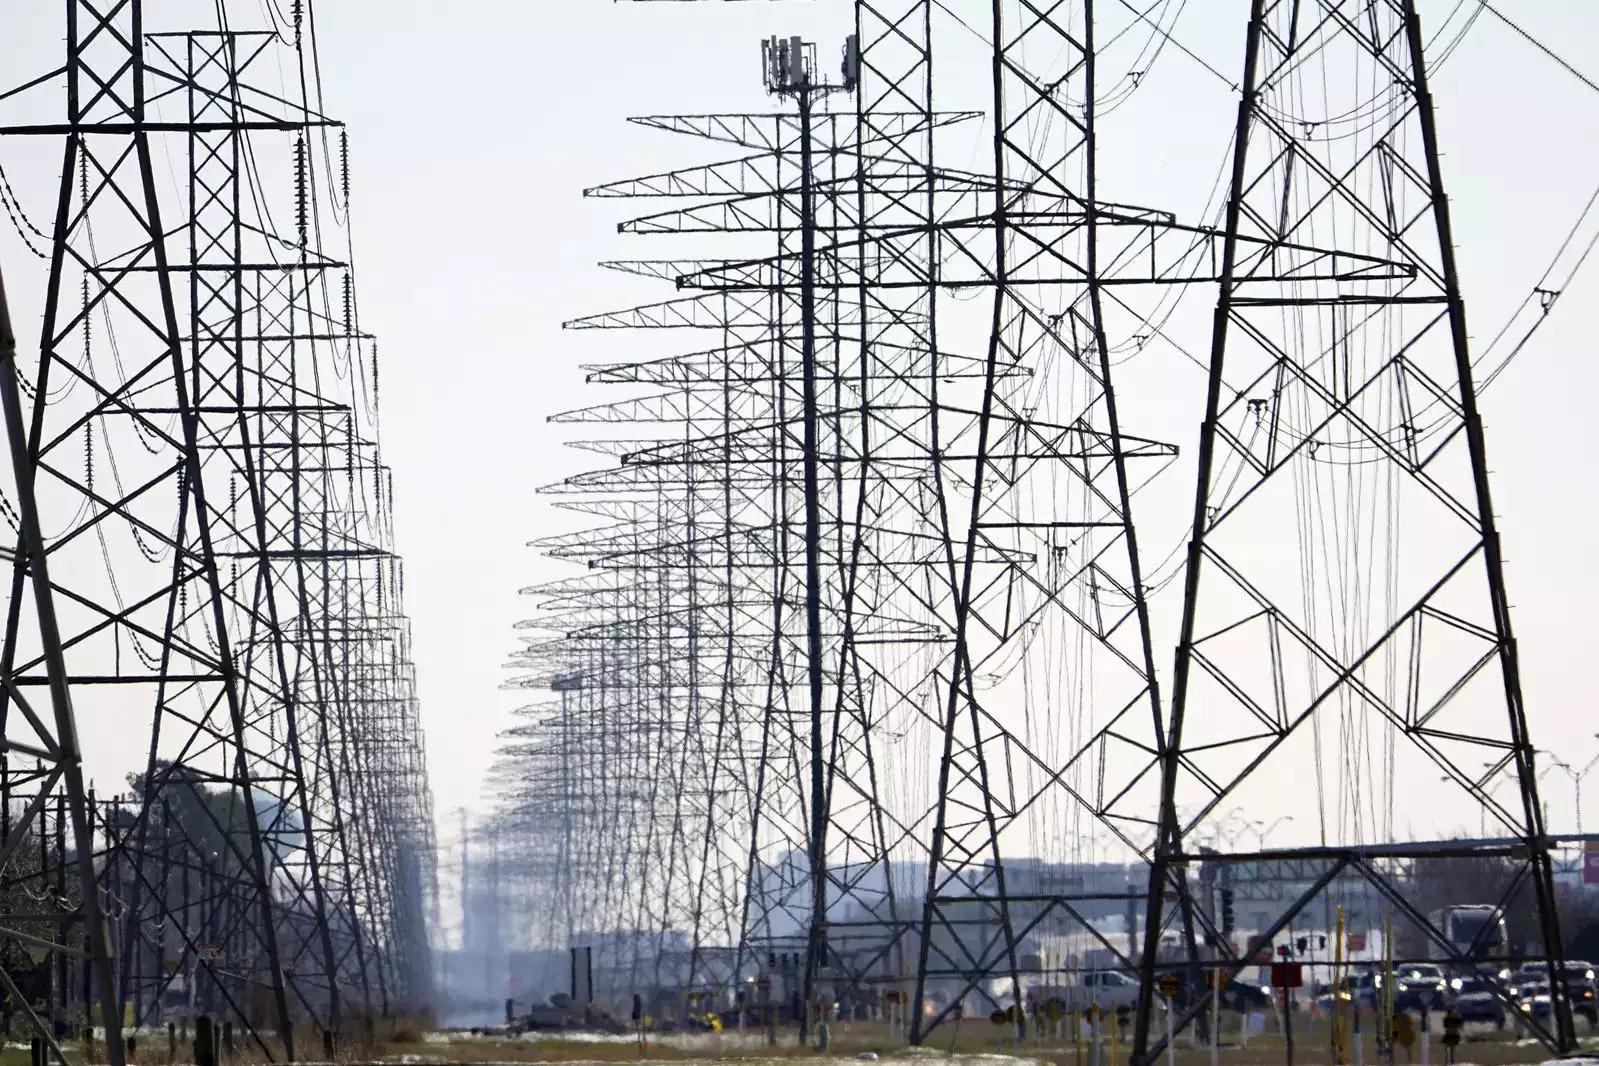 At 6,499 MW, Delhi Sees Highest Power Demand This Summer